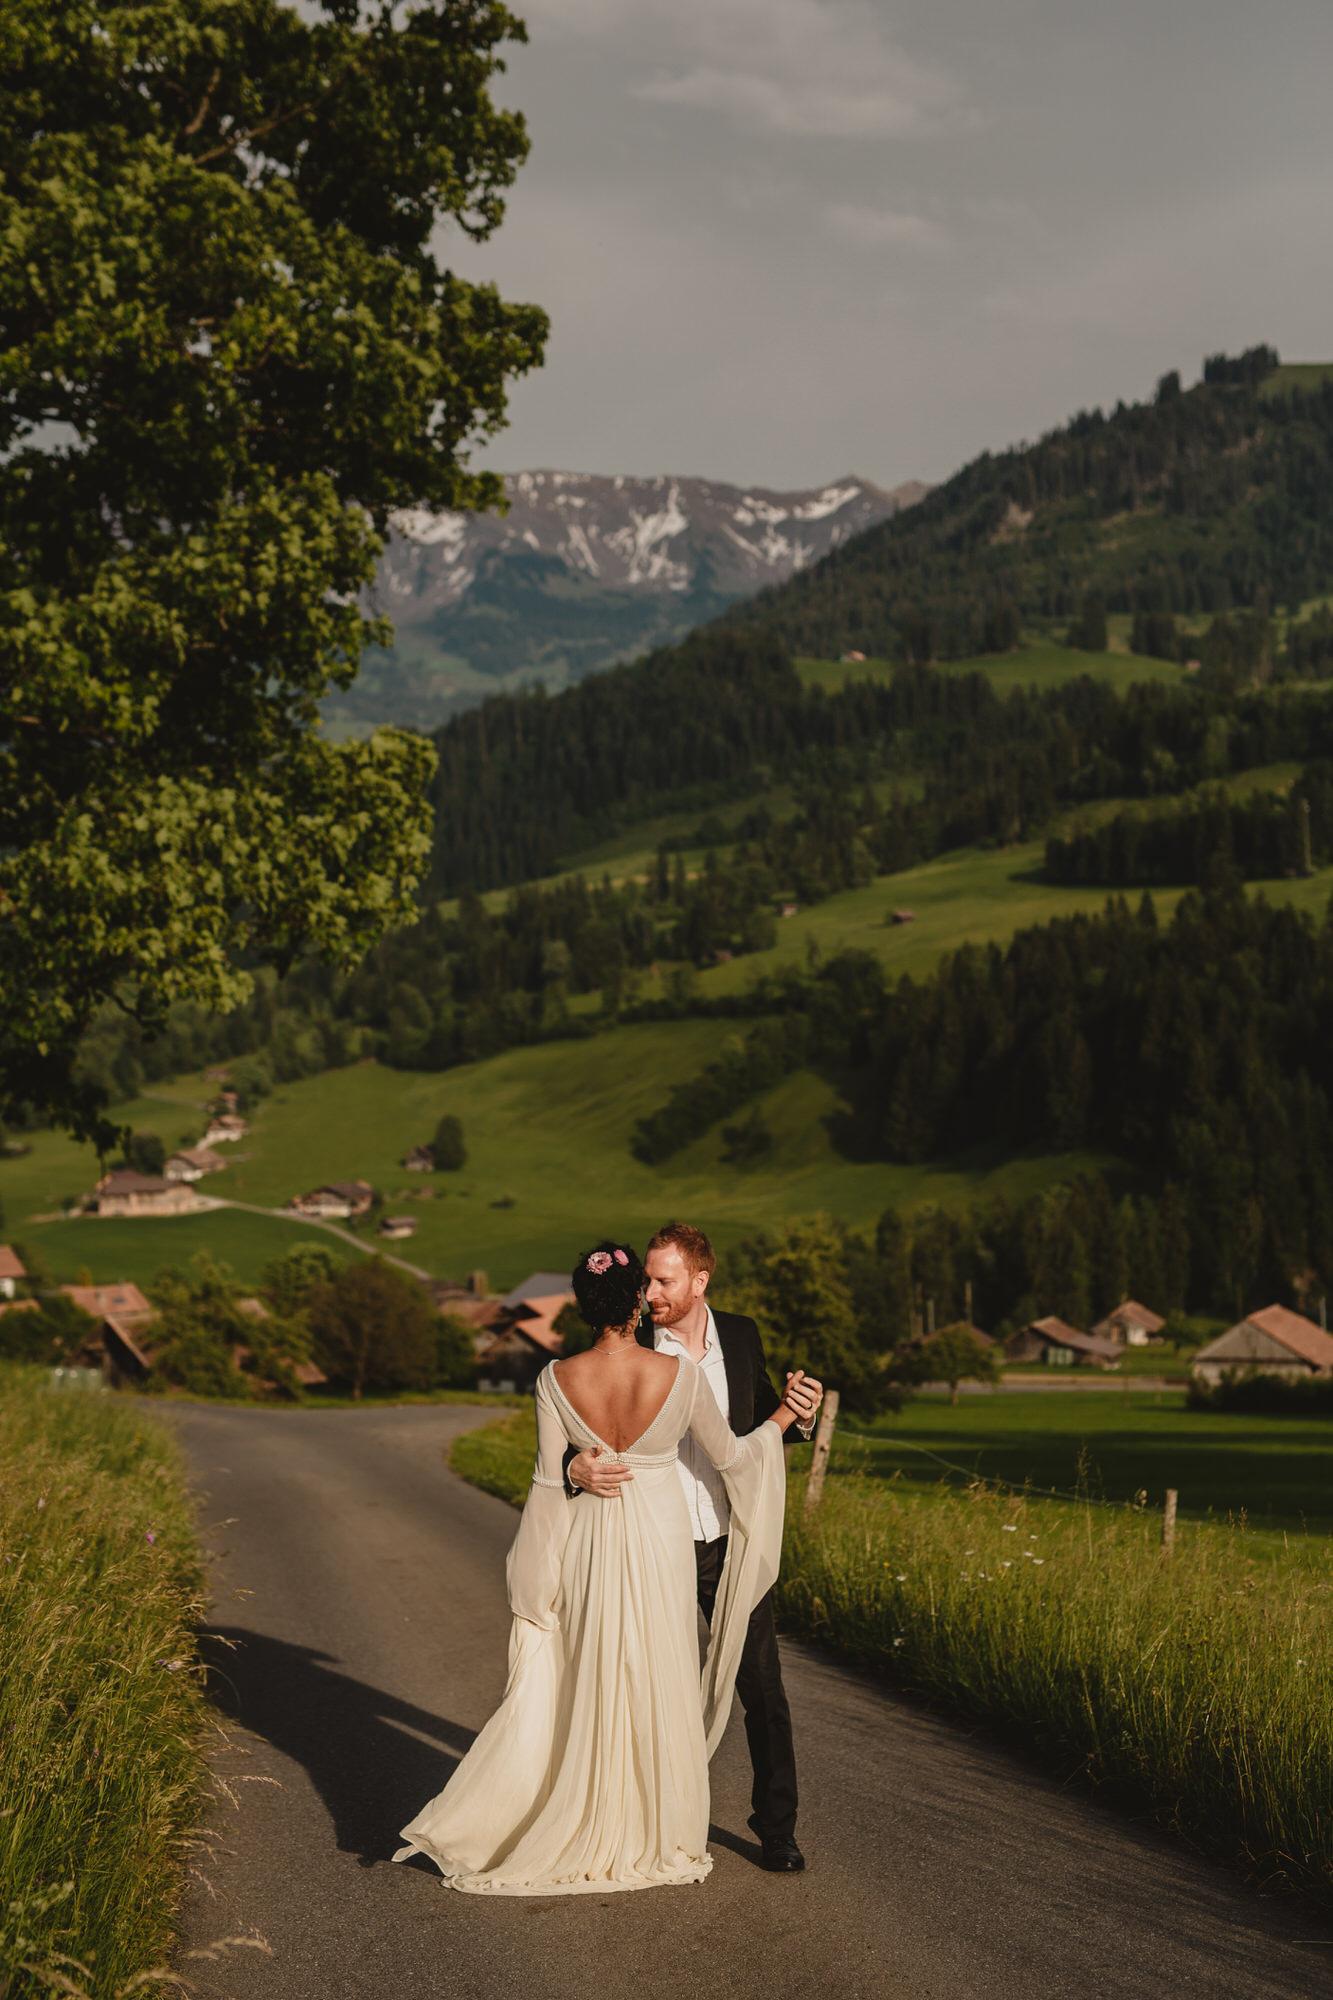 SWITZERLAND WEDDING SHOOT - JENNIFER PICARD PHOTOGRAPHY - SWITZERLAND WEDDING PHOTOGRAPHER - VANCOUVER WEDDING PHOTOGRAPHER -  (215).jpg